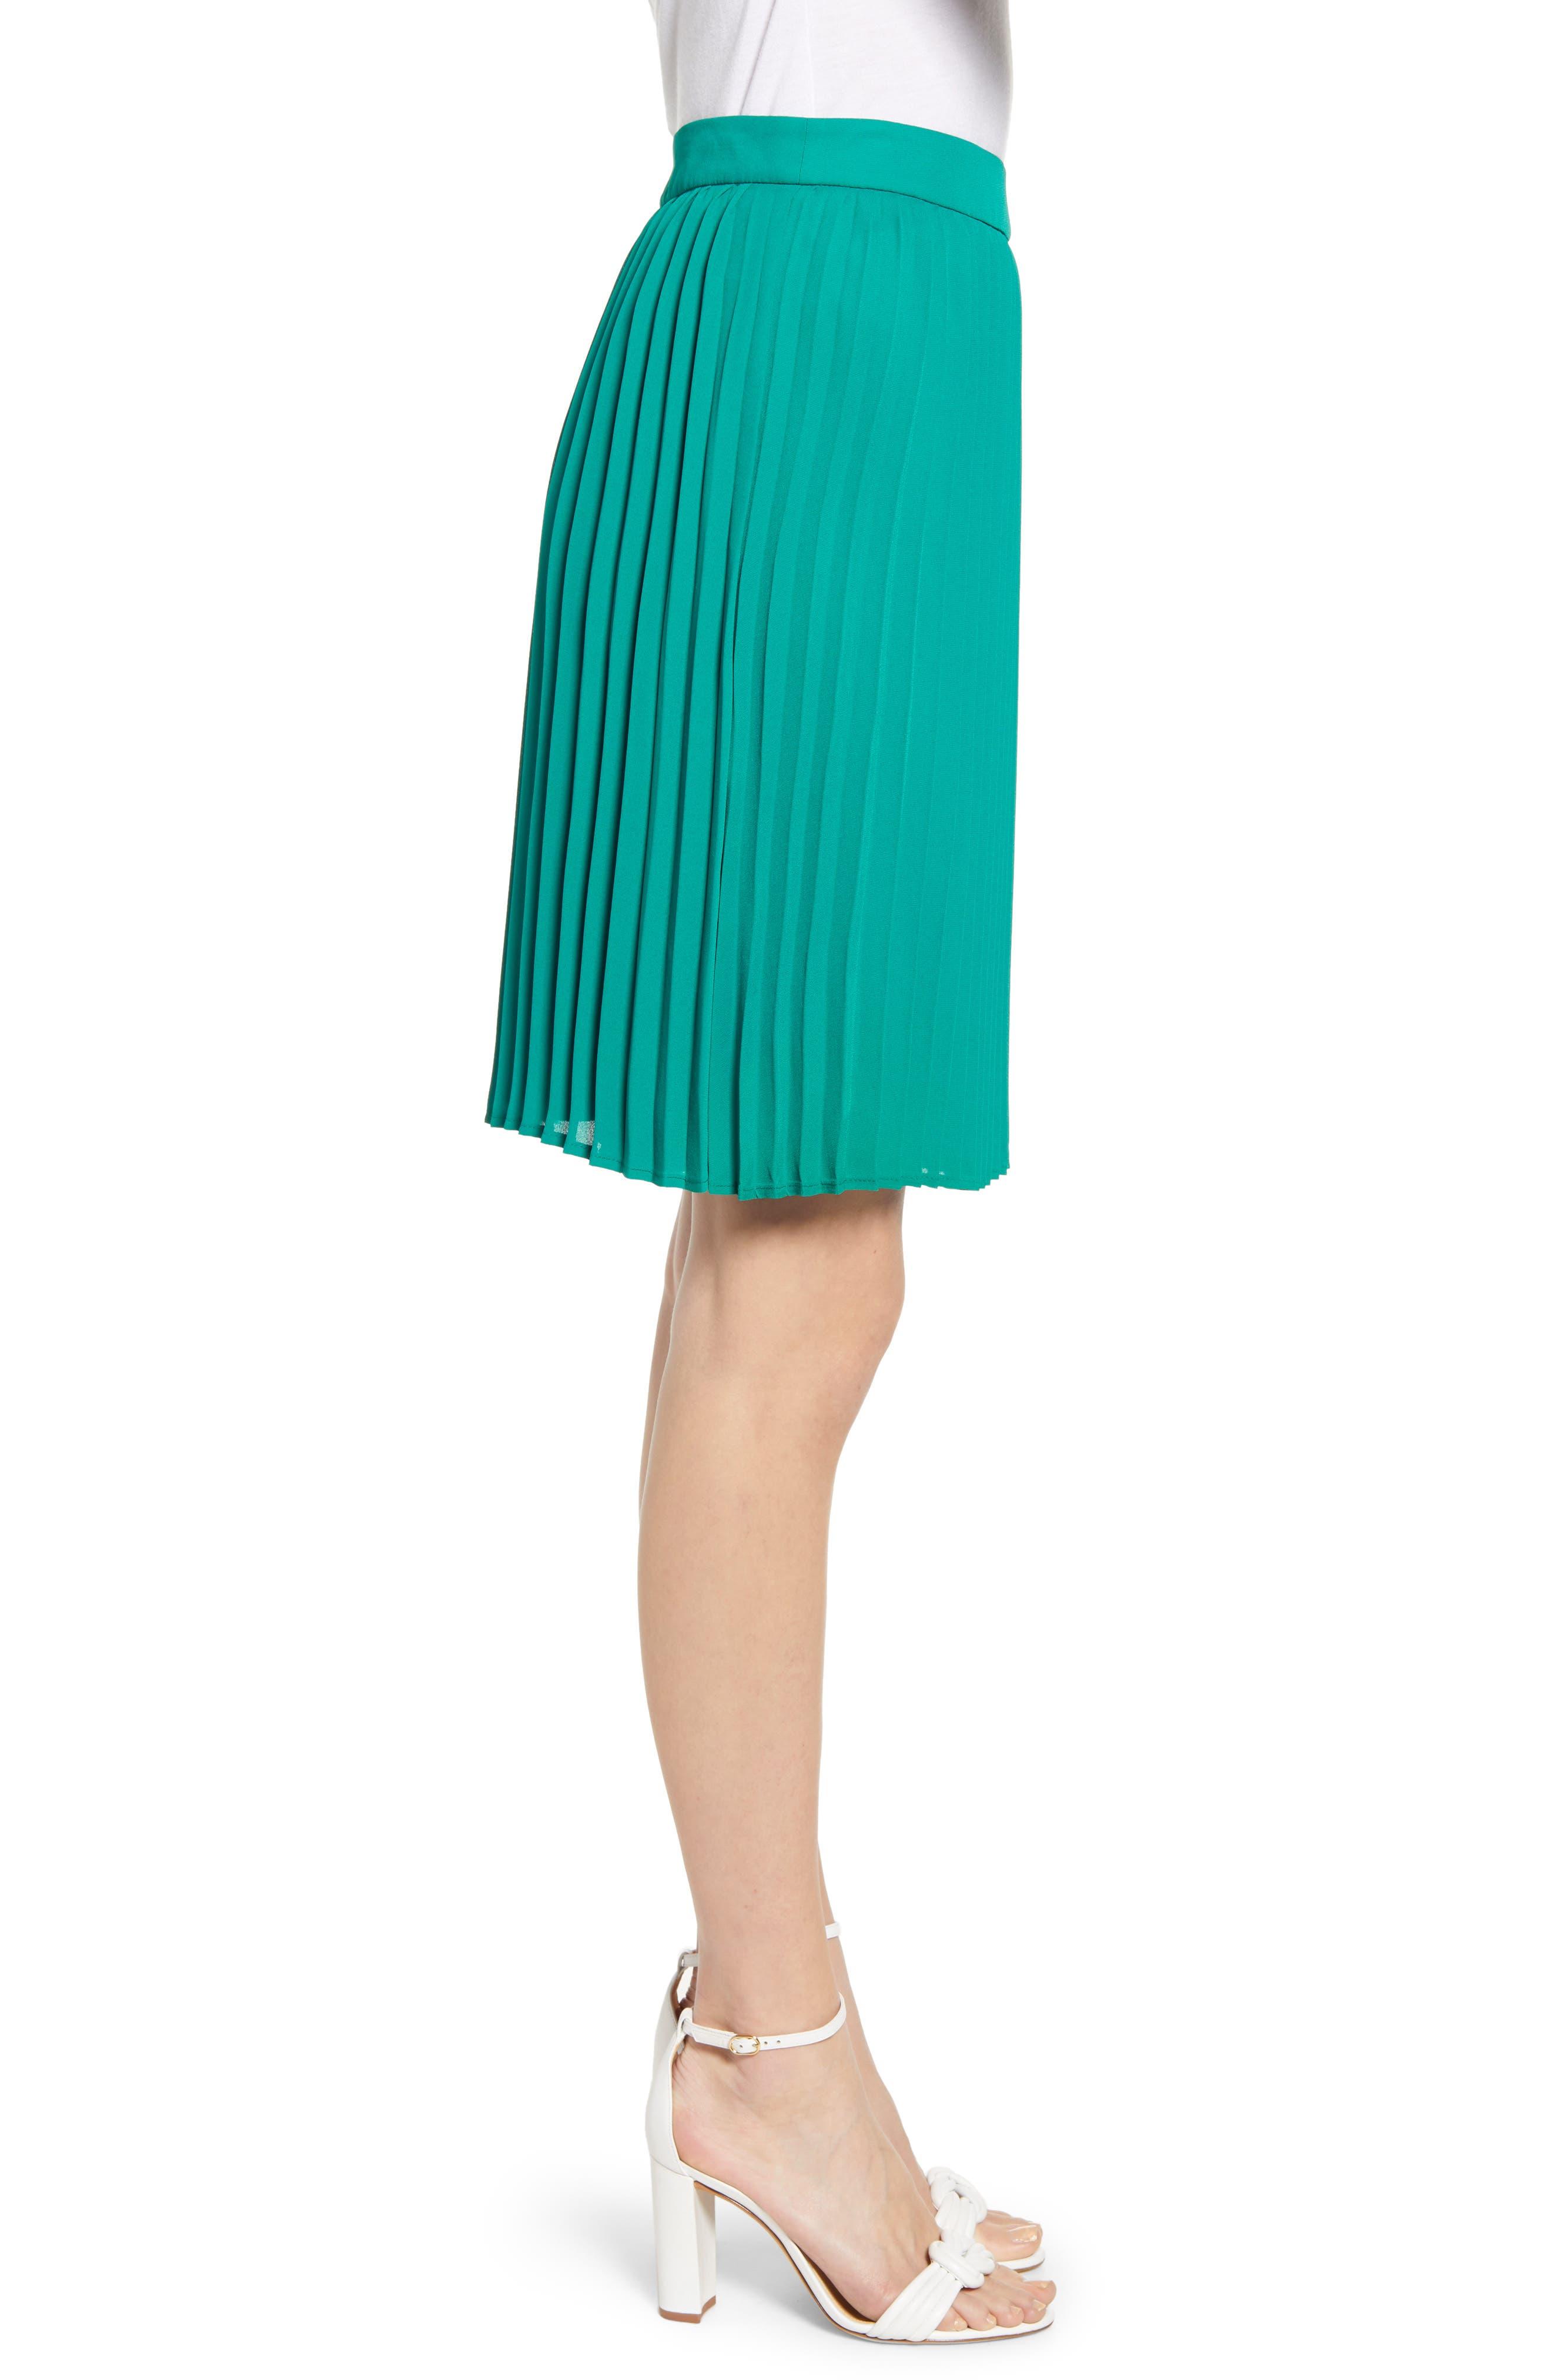 GIBSON, x International Women's Day Thamarr Pleated Skirt, Alternate thumbnail 3, color, GREEN